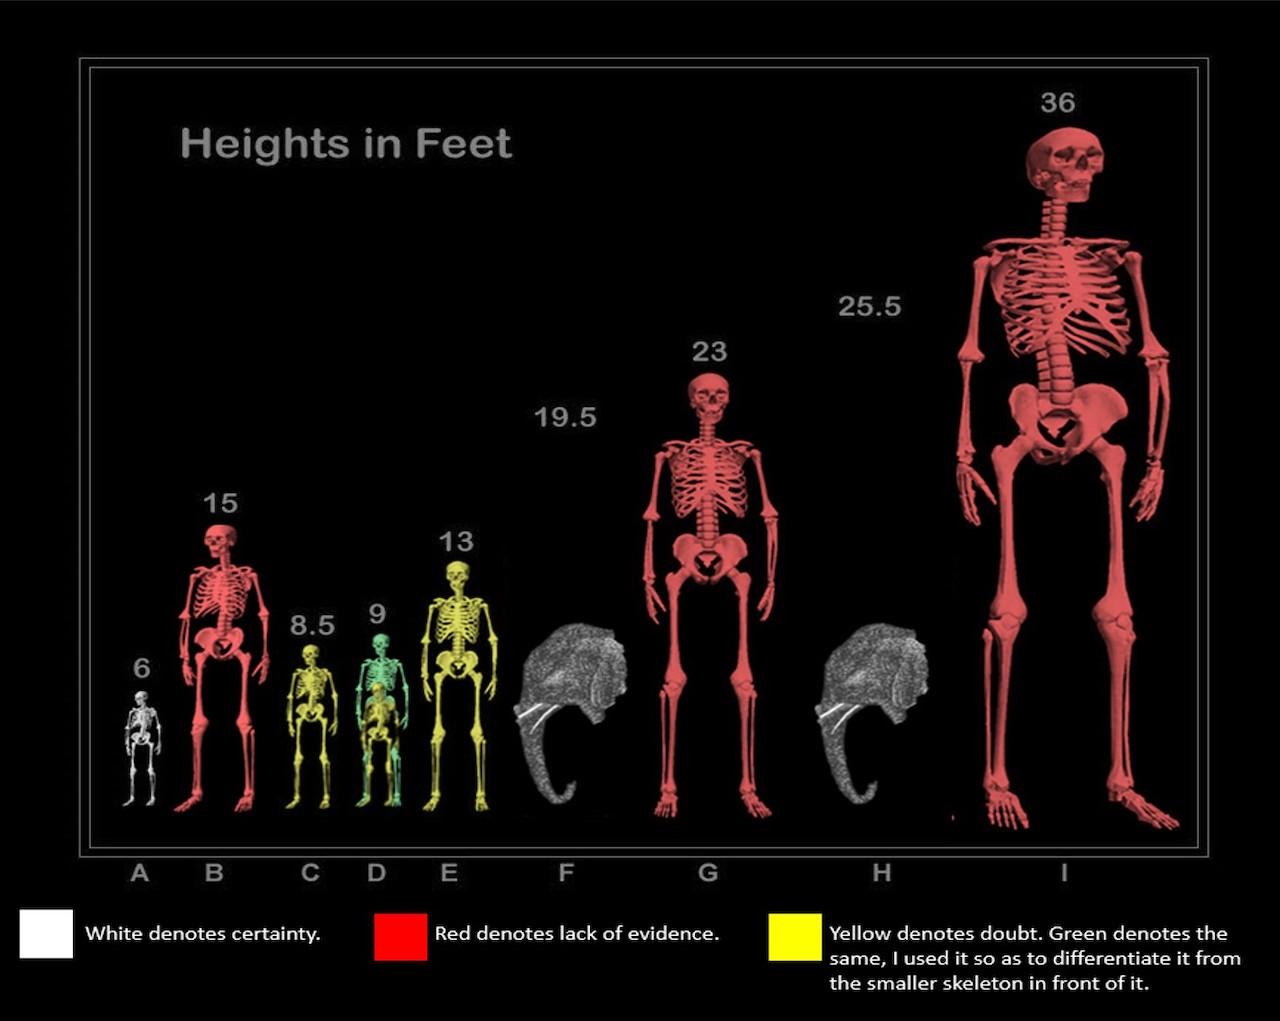 Skeleton Of 25 Foot Giant Human Found In Ecuador